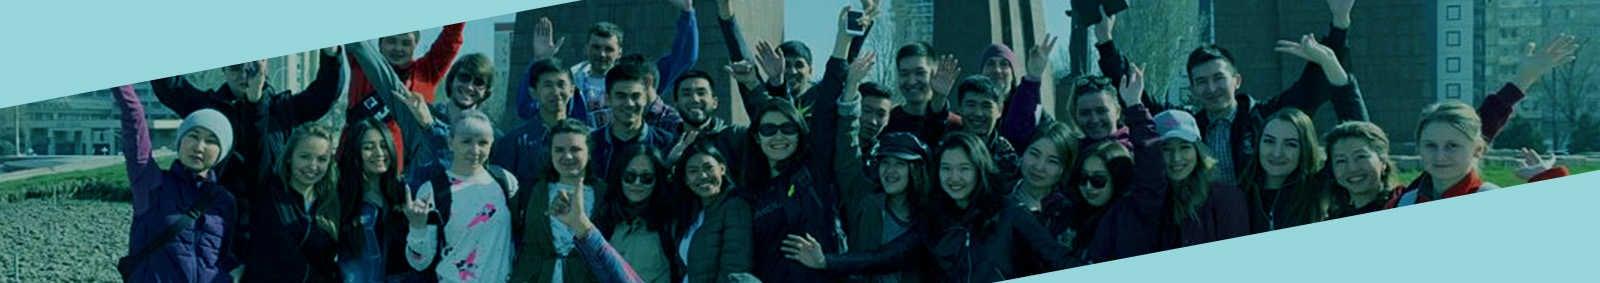 Kyrgyzstan Kickstart Community Project